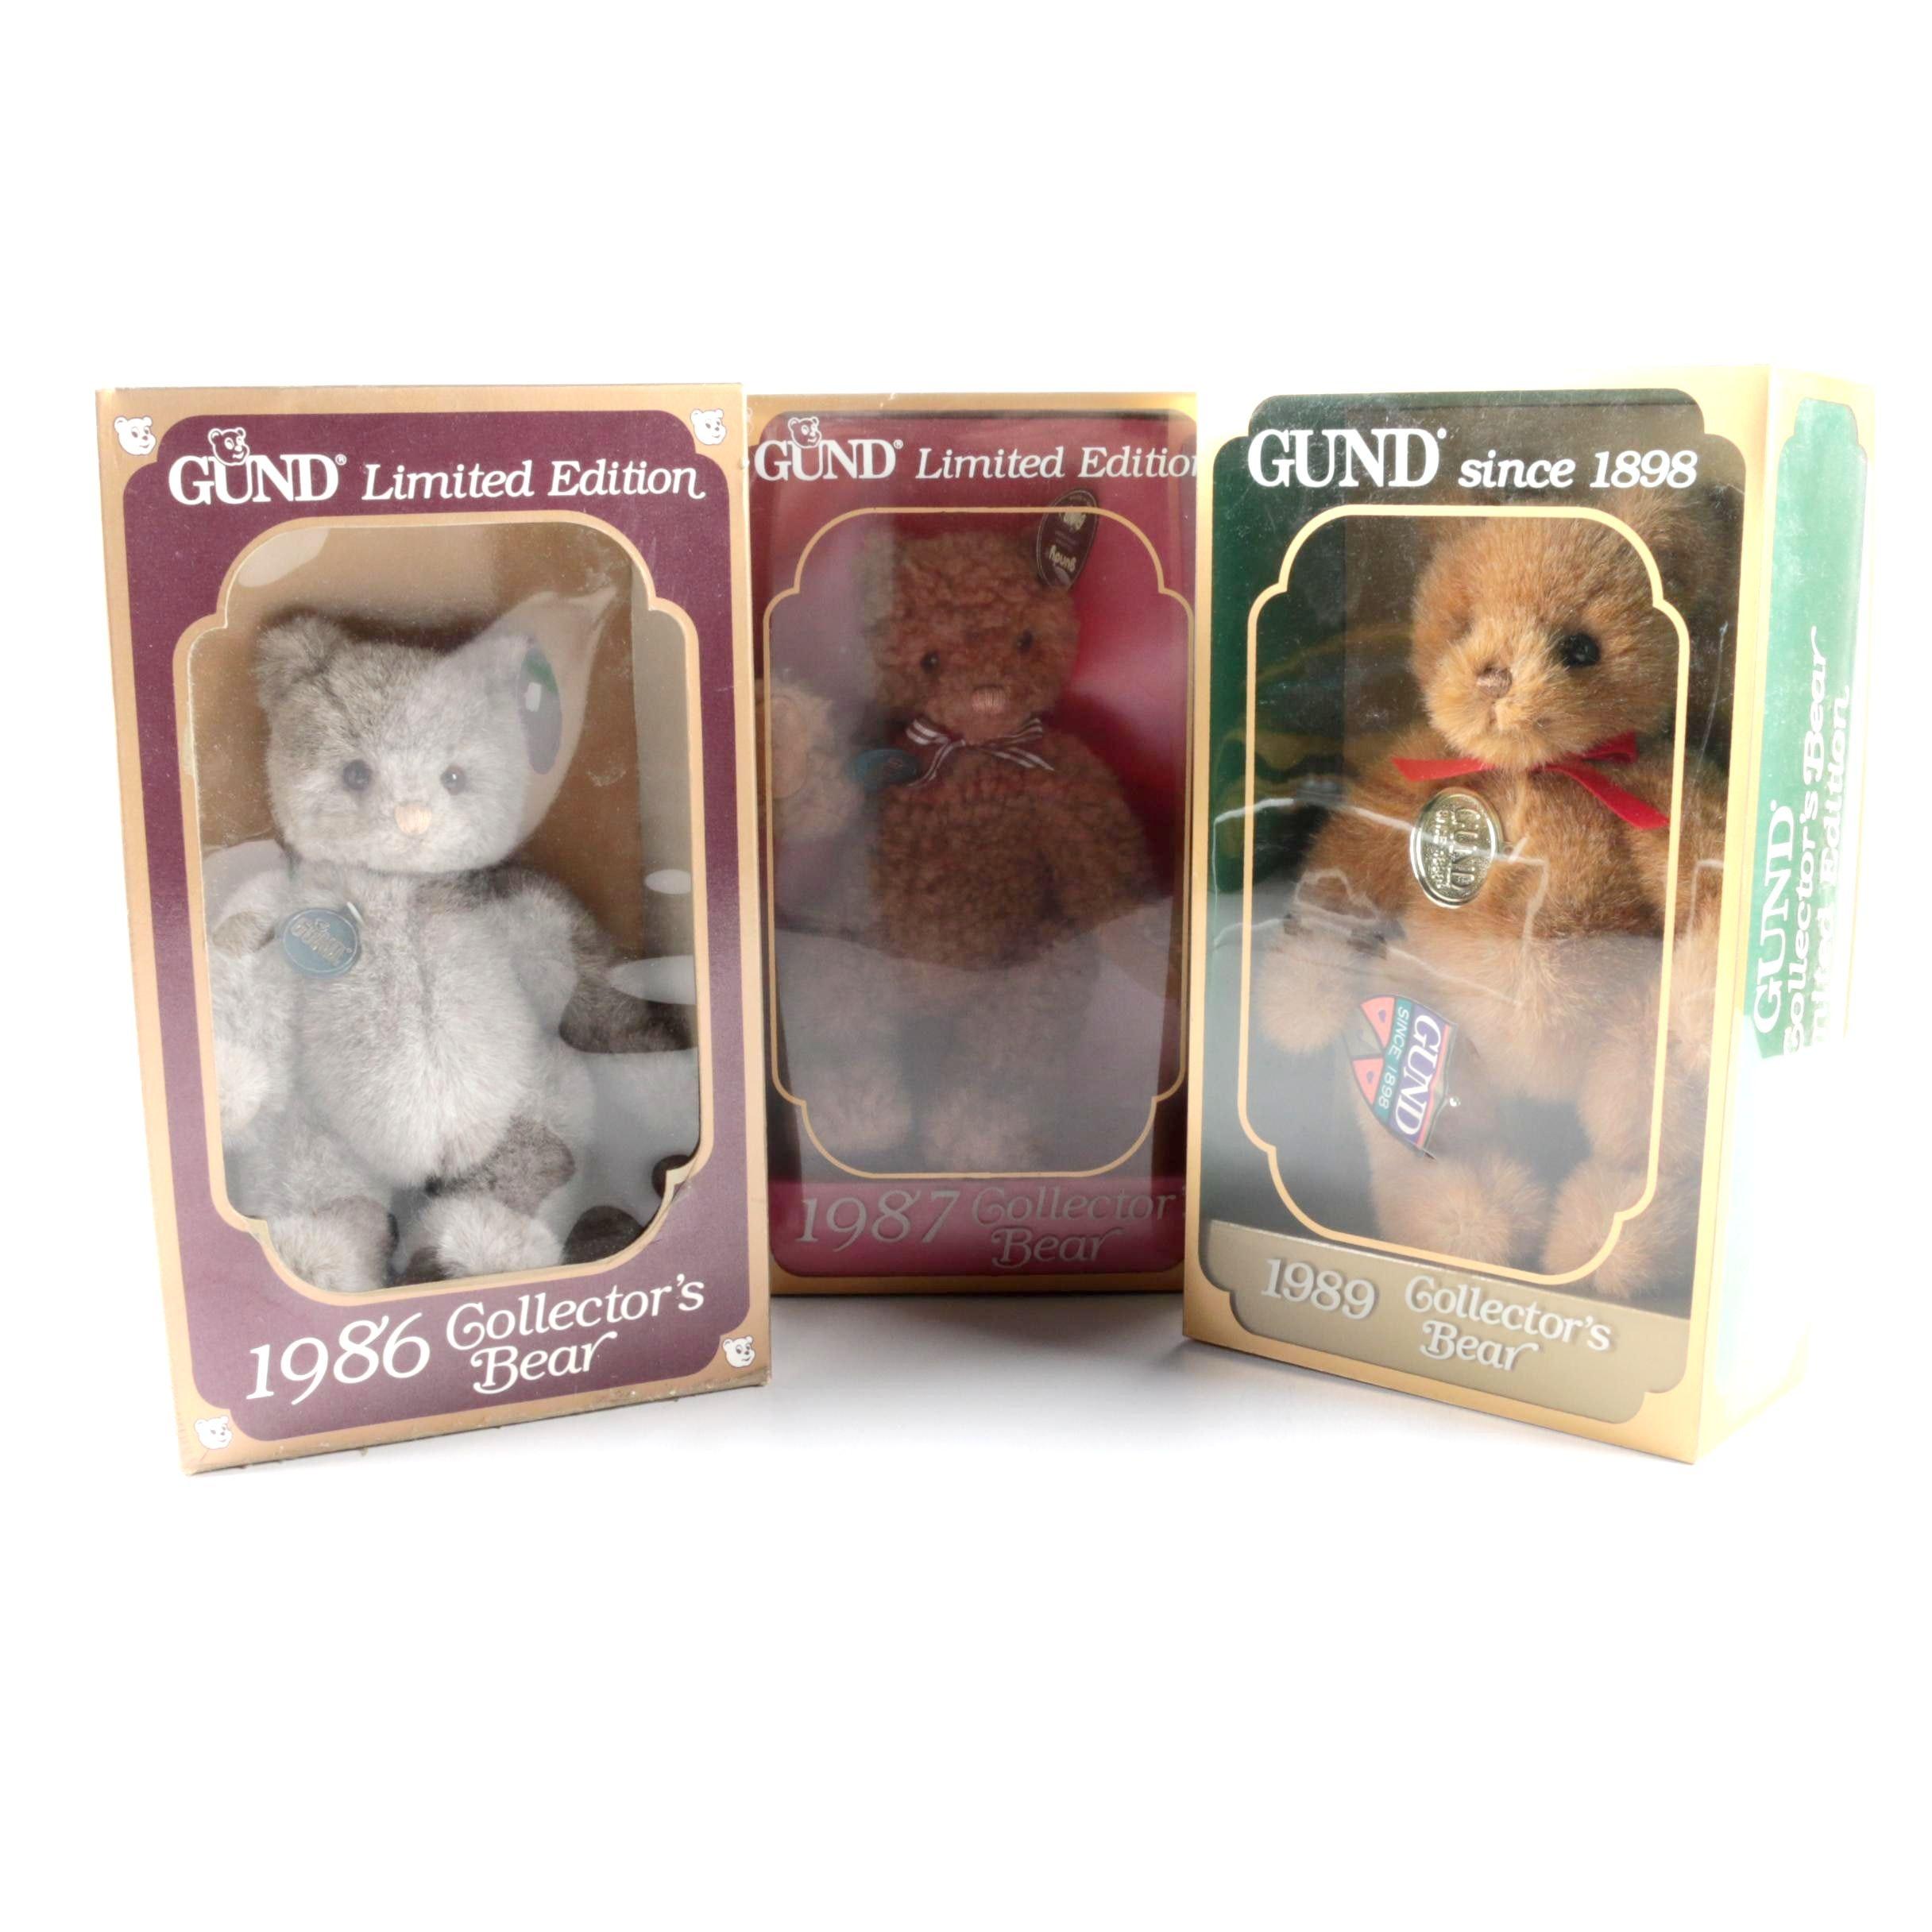 1980s Gund Limited Edition Teddy Bears